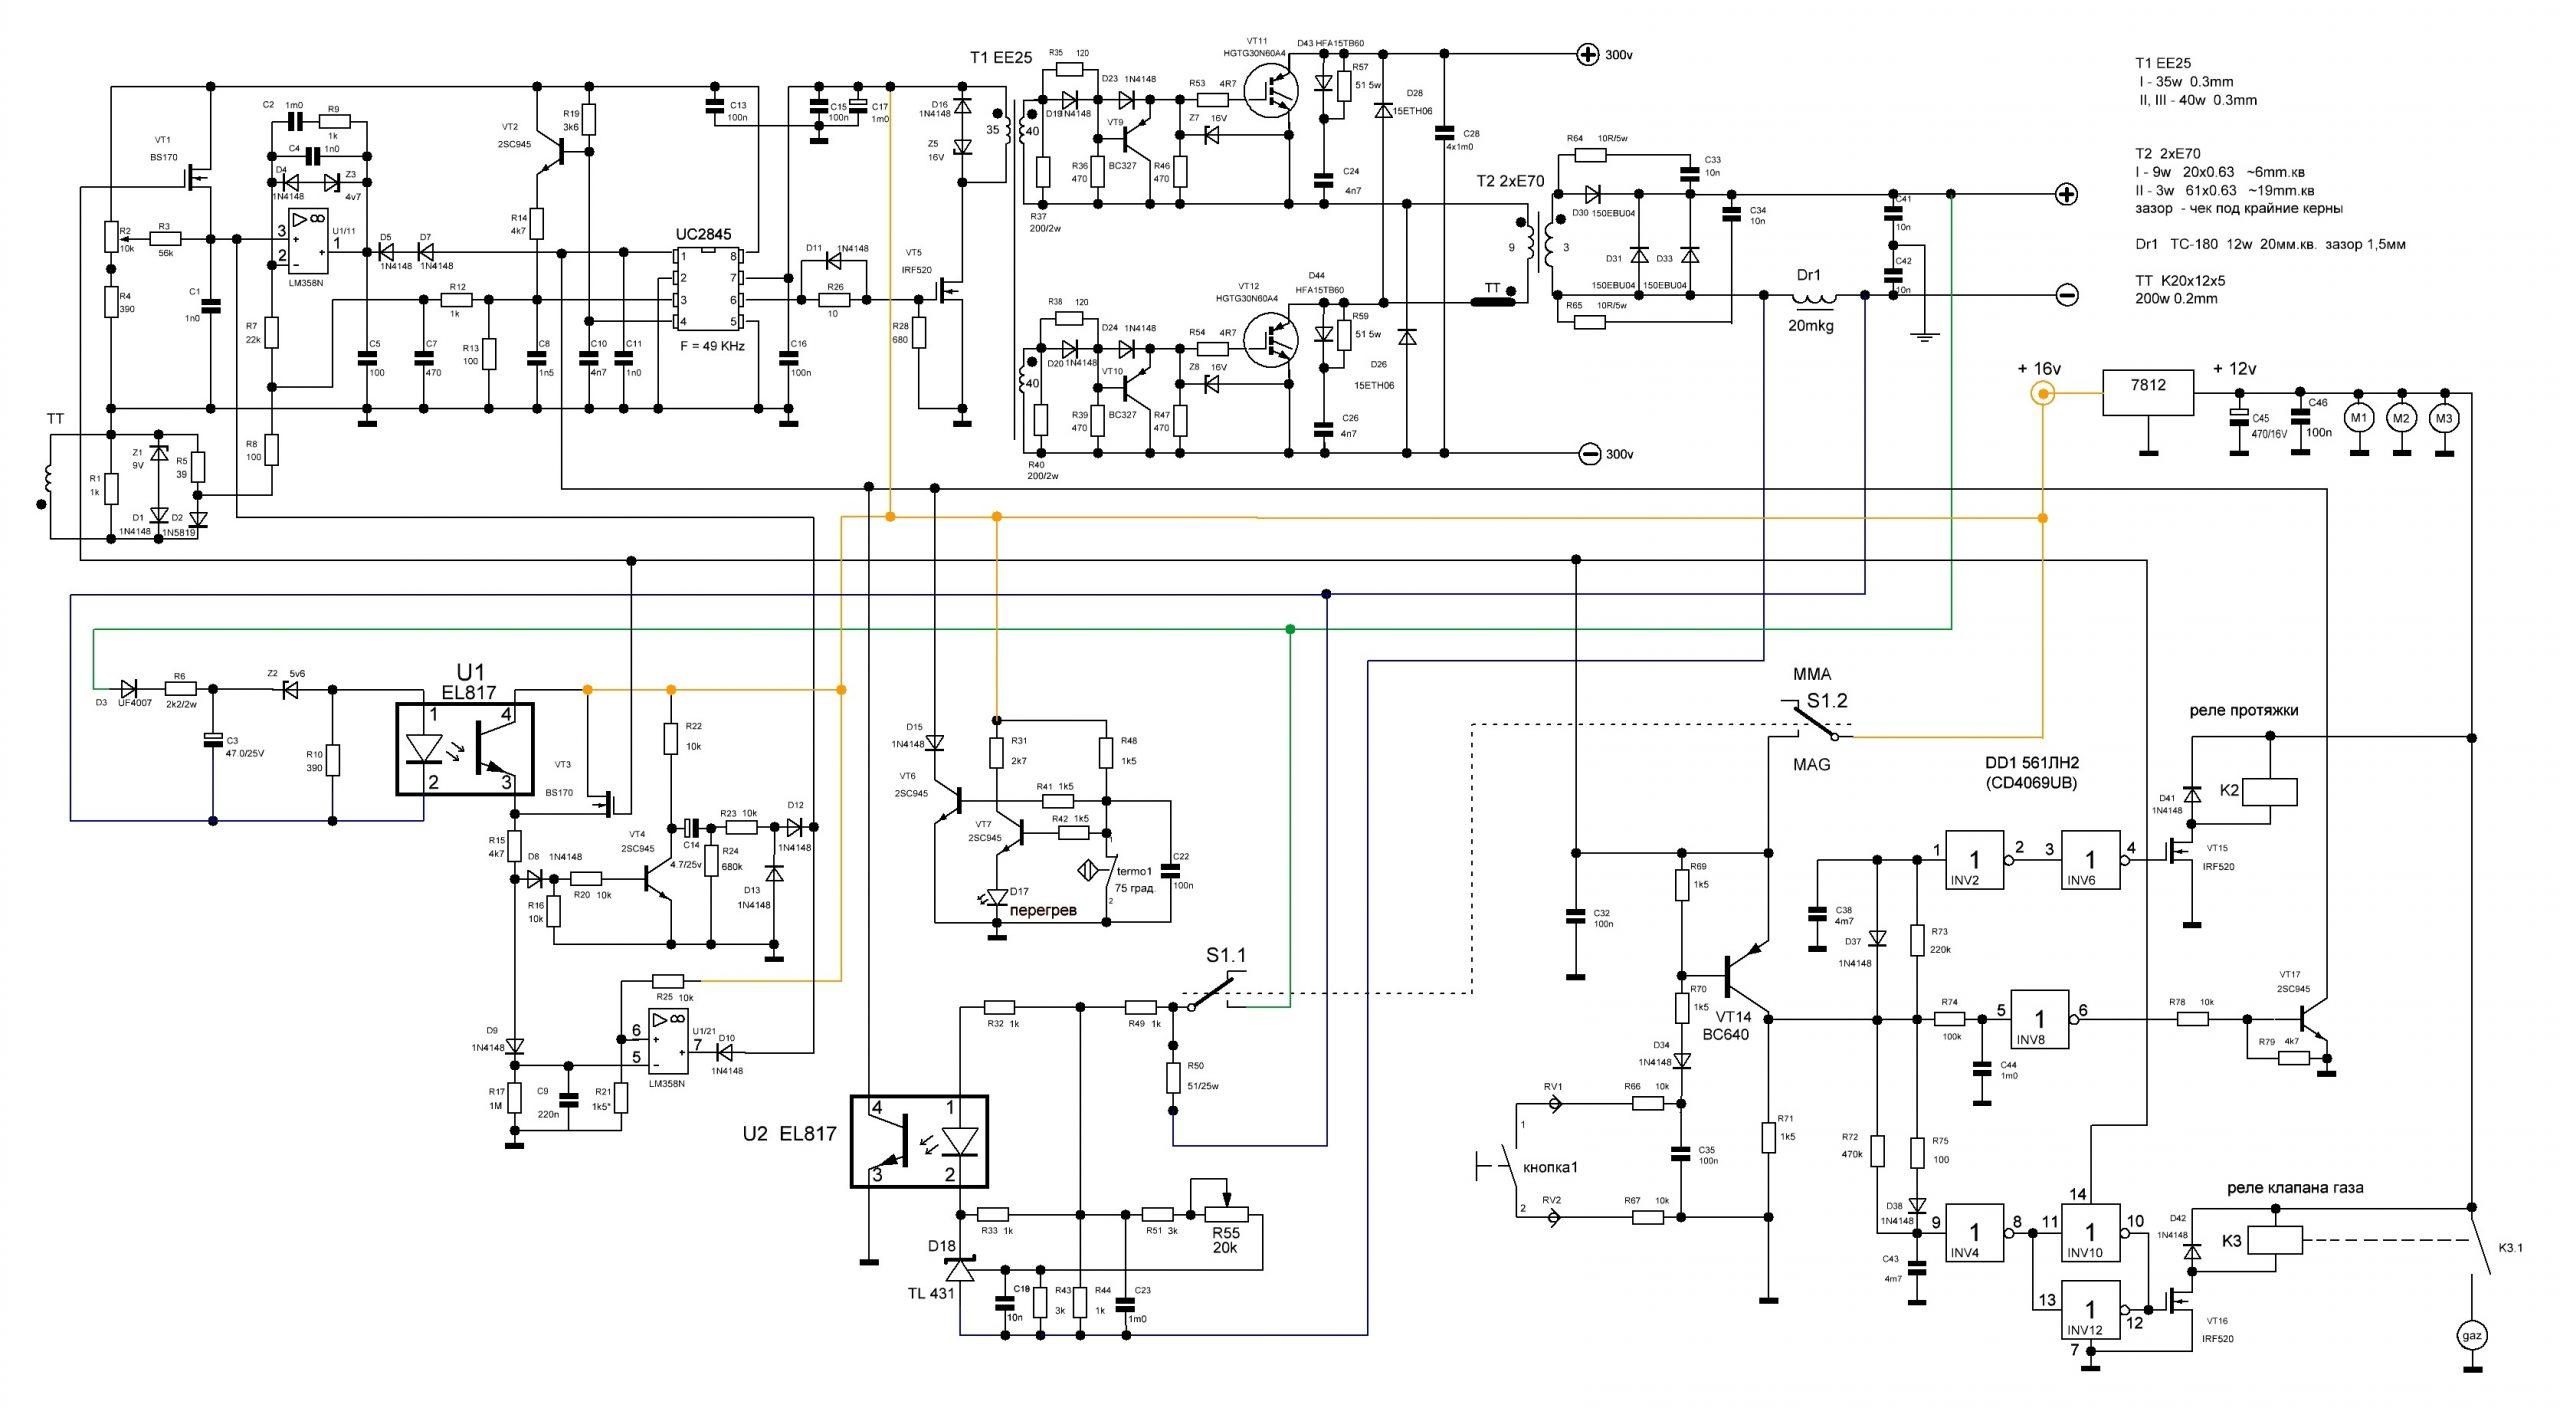 Схема полуавтомата из интернета